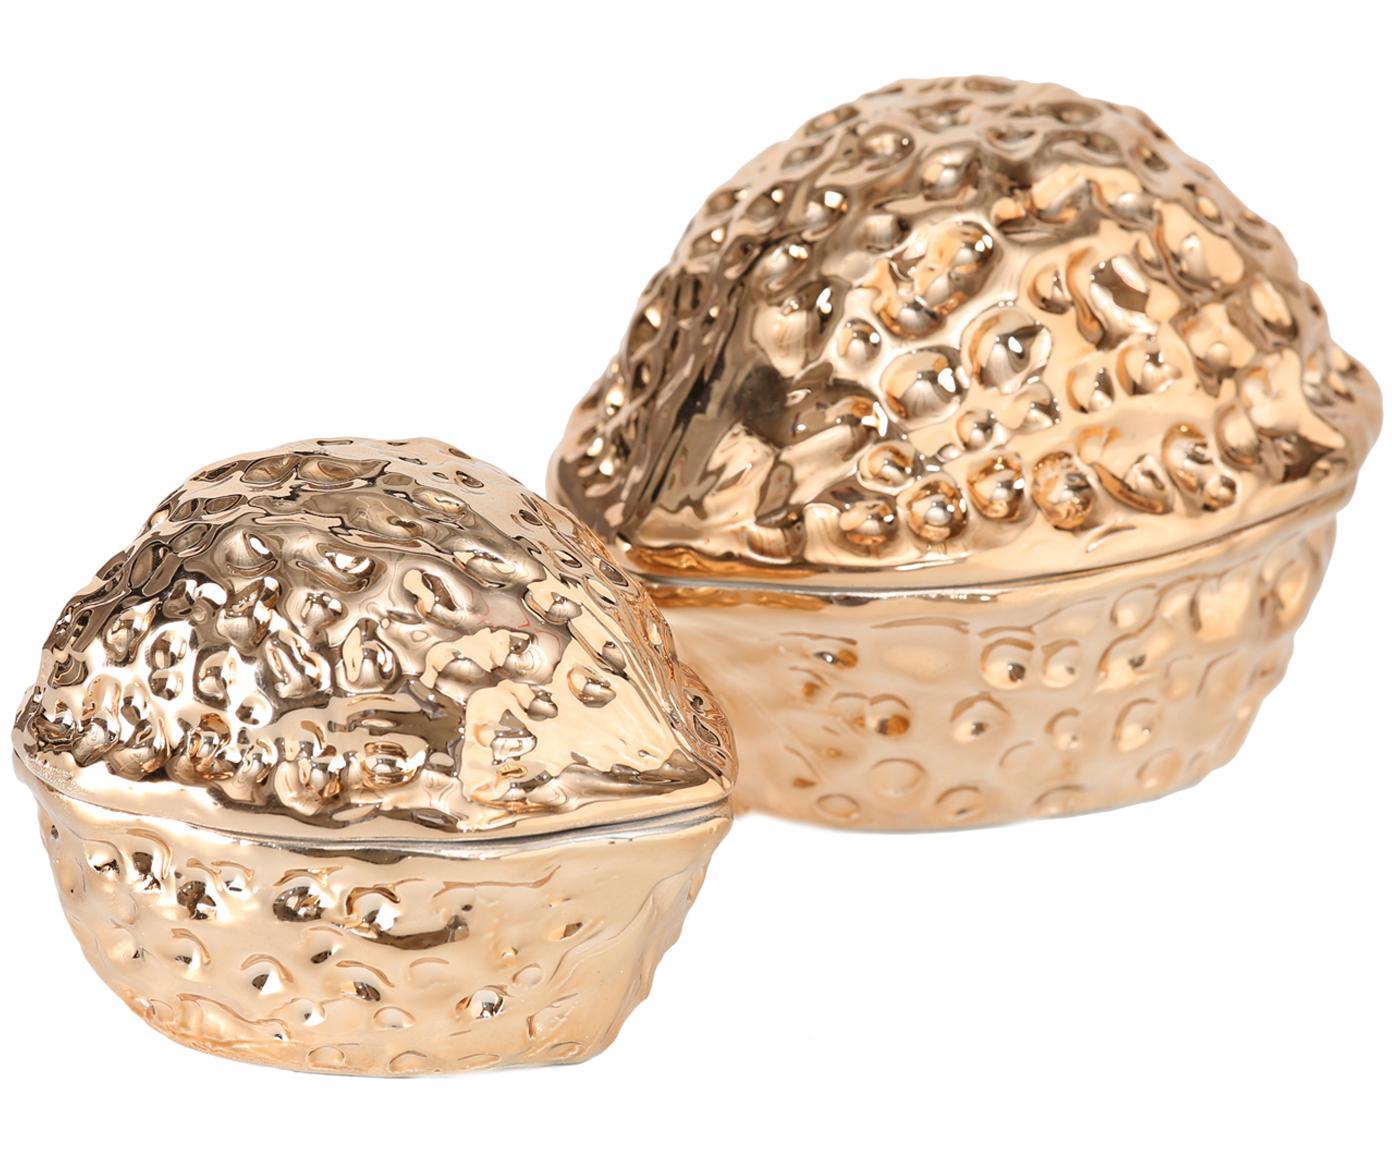 Set de tarros decorativos Walnut, 2pzas., Porcelana, Dorado, Tamaños diferentes